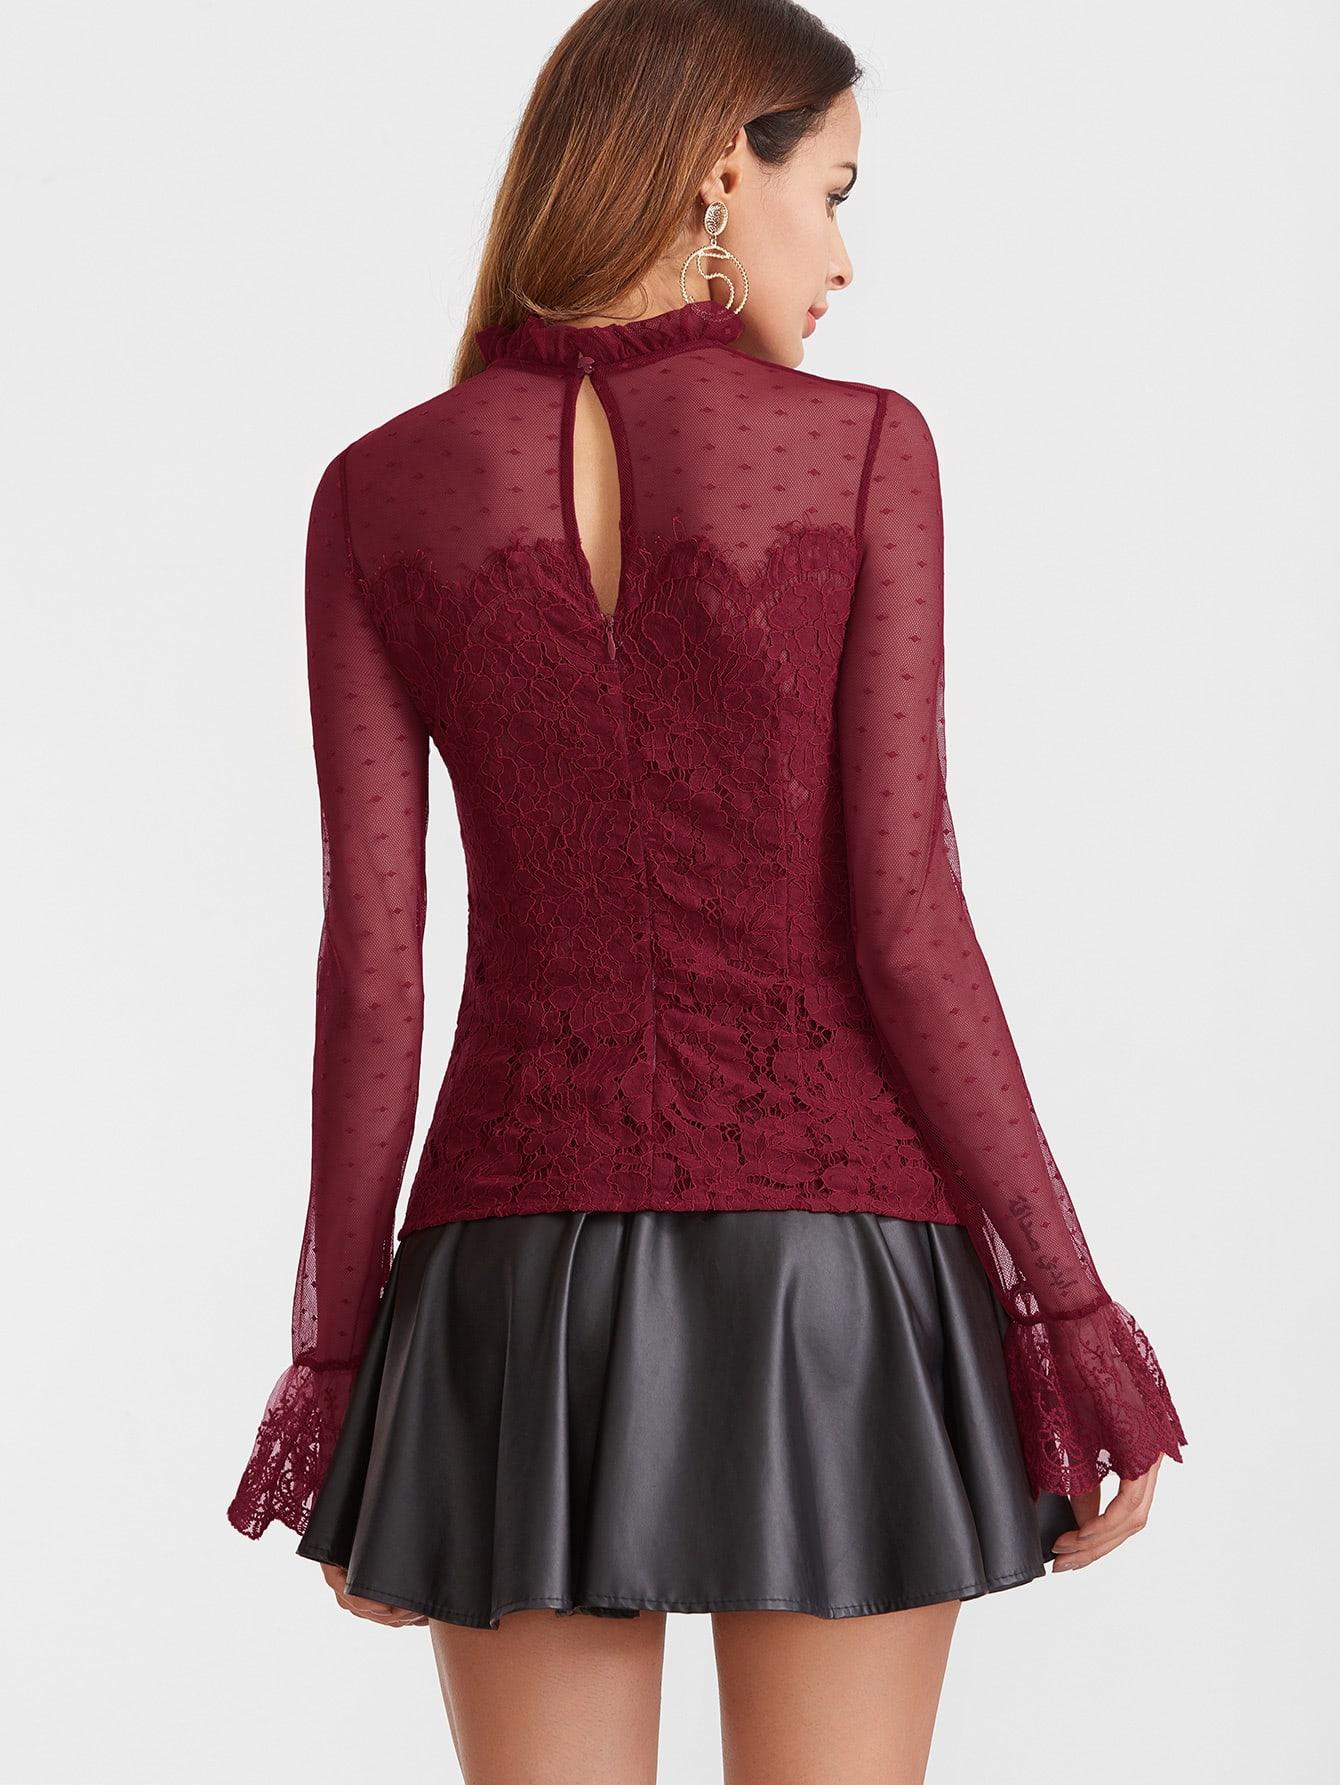 blouse161214704_2